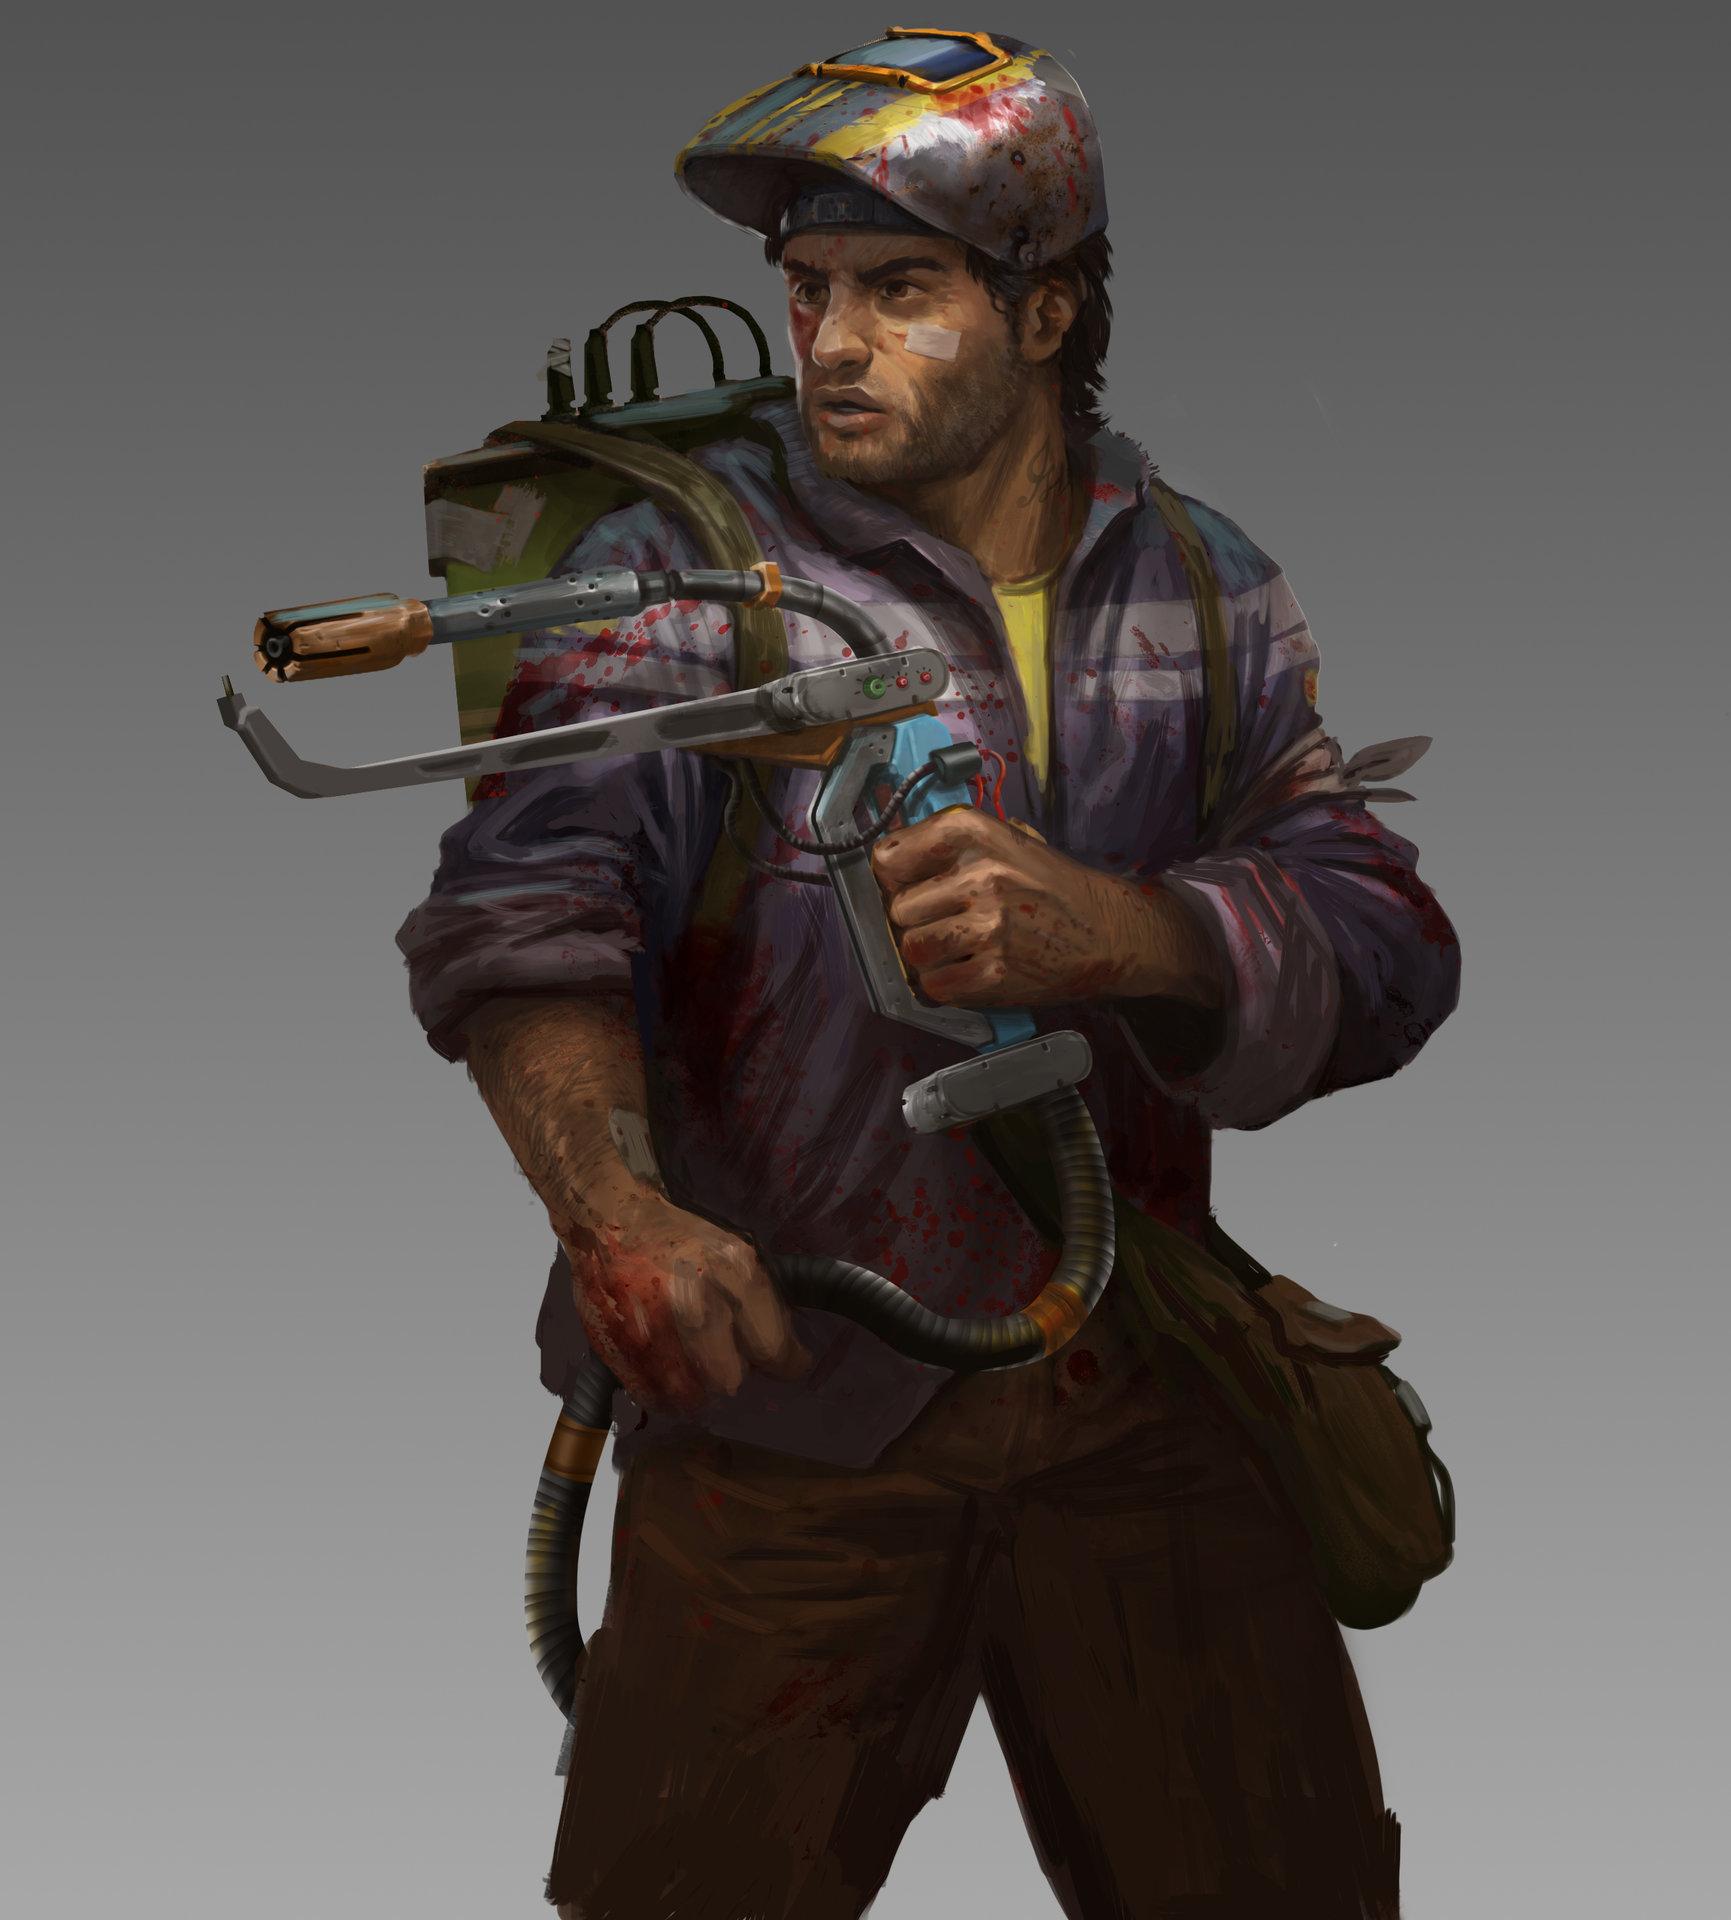 Roberto robert ship welder finalv02rev